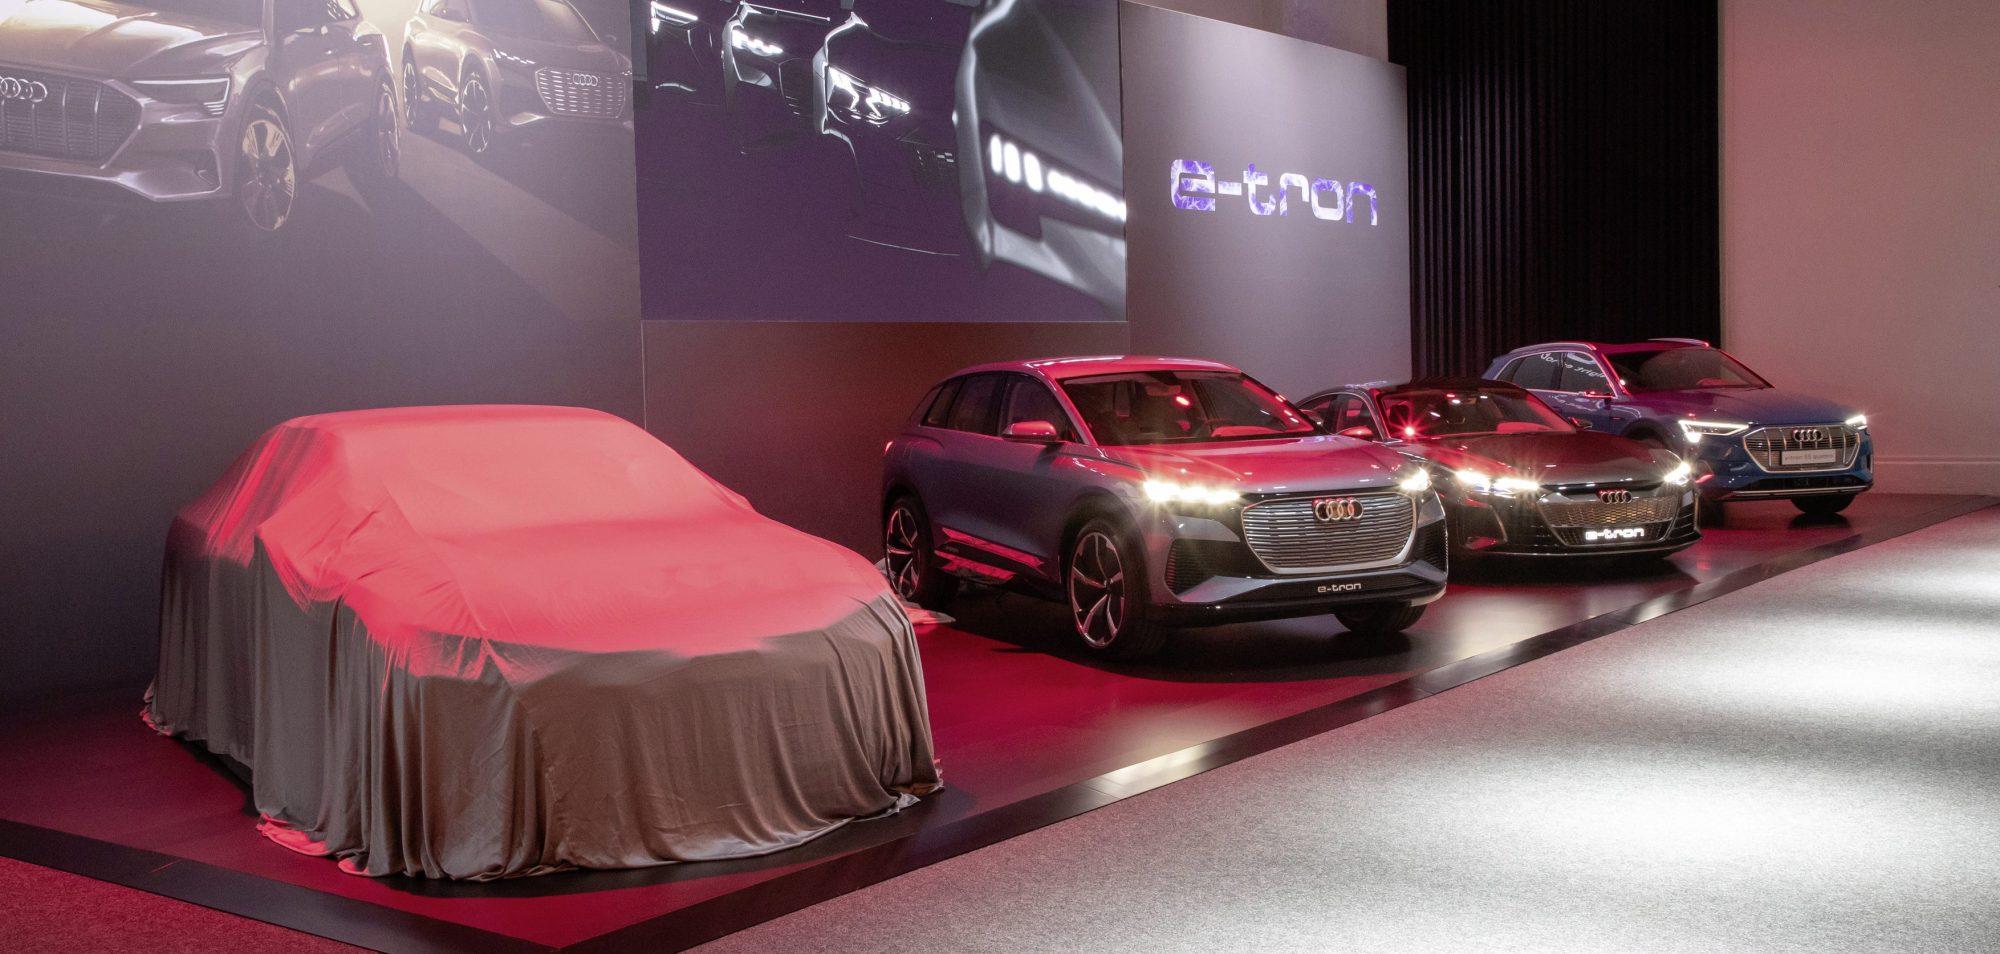 Audi elektromobil Artemis (Foto: Daniel Wollstein/Audi)